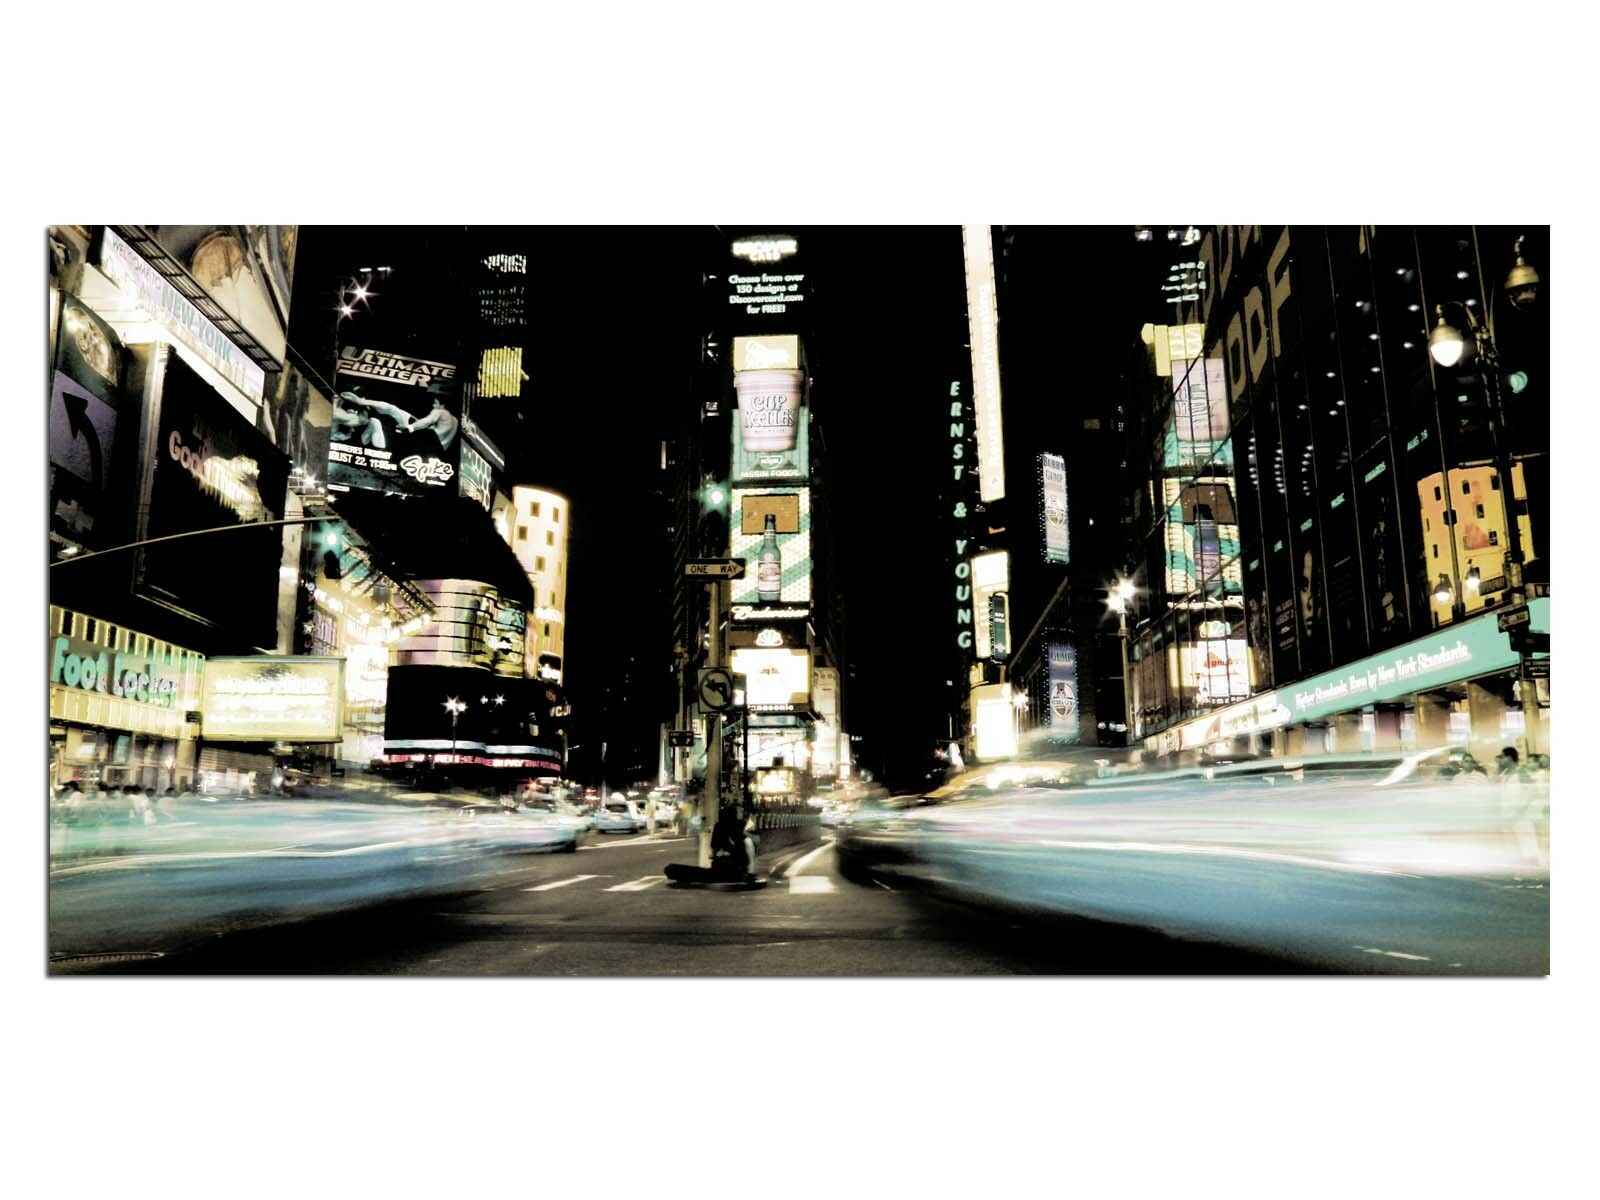 HD Glasbild EG4100500918 TIMES SQUARE NYC RETRO 100 x 50 cm Wandbild STADT